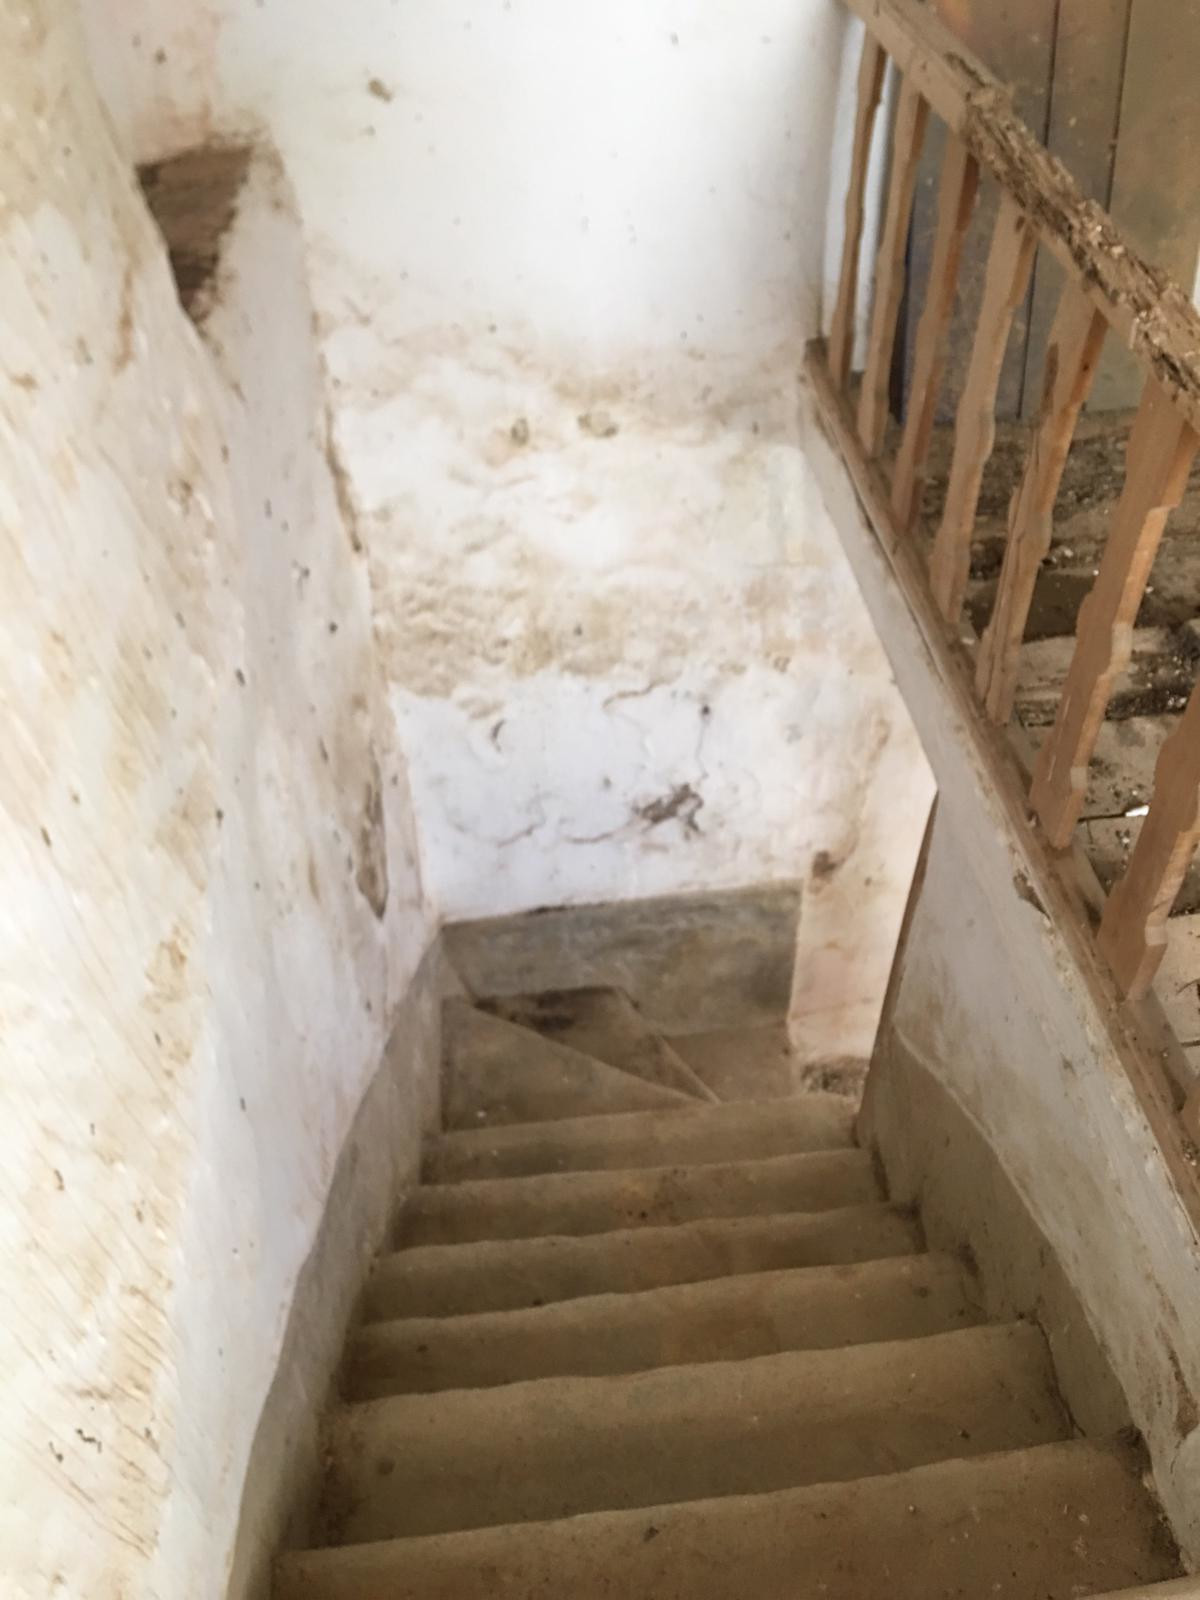 For Sale - Semi-Detached House - Casares - 2 - homeandhelp.com